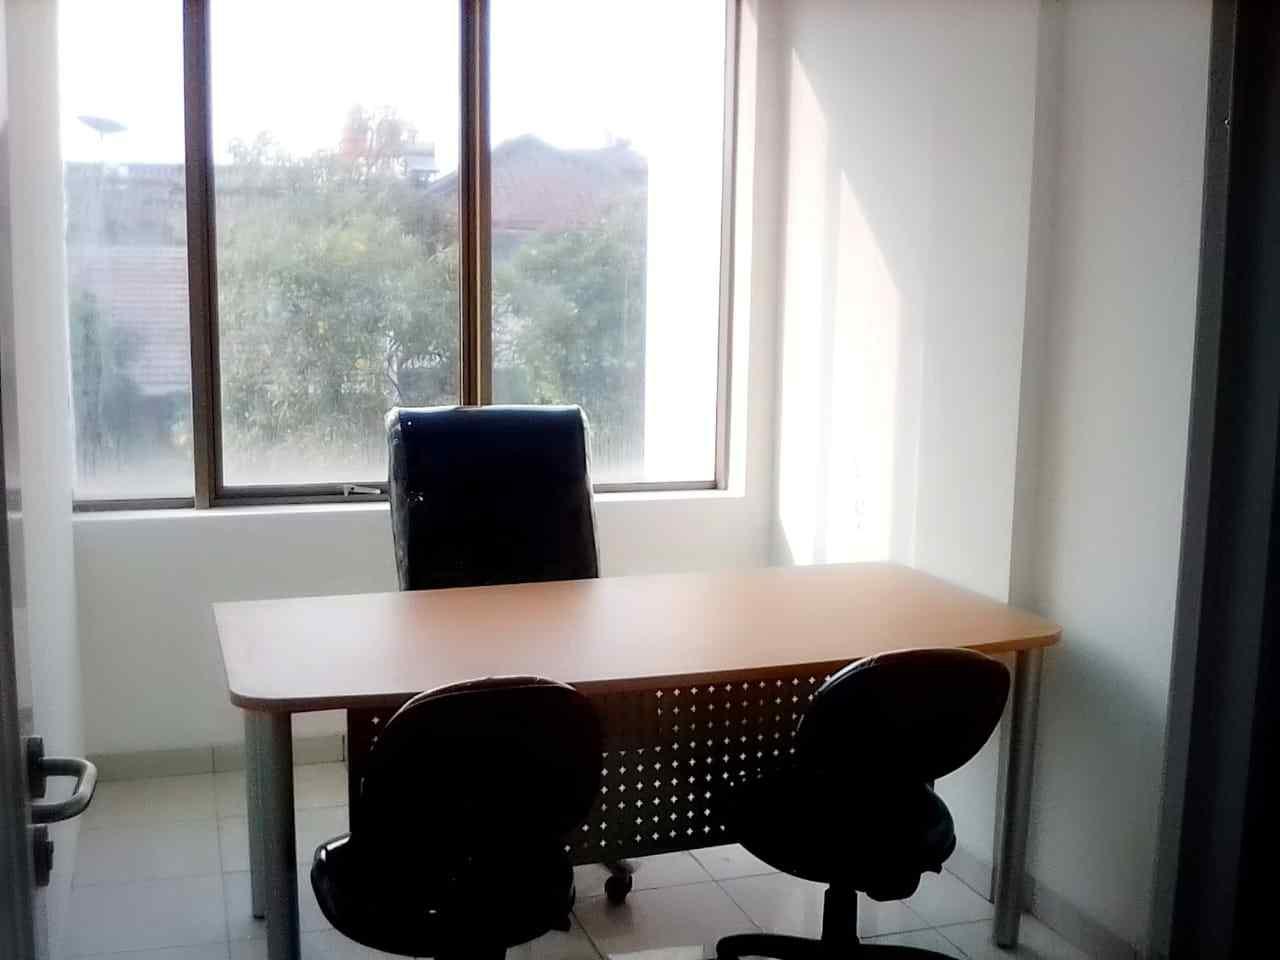 Hasil pekerjaan jasa renovasi kantor di Jakarta Barat 5